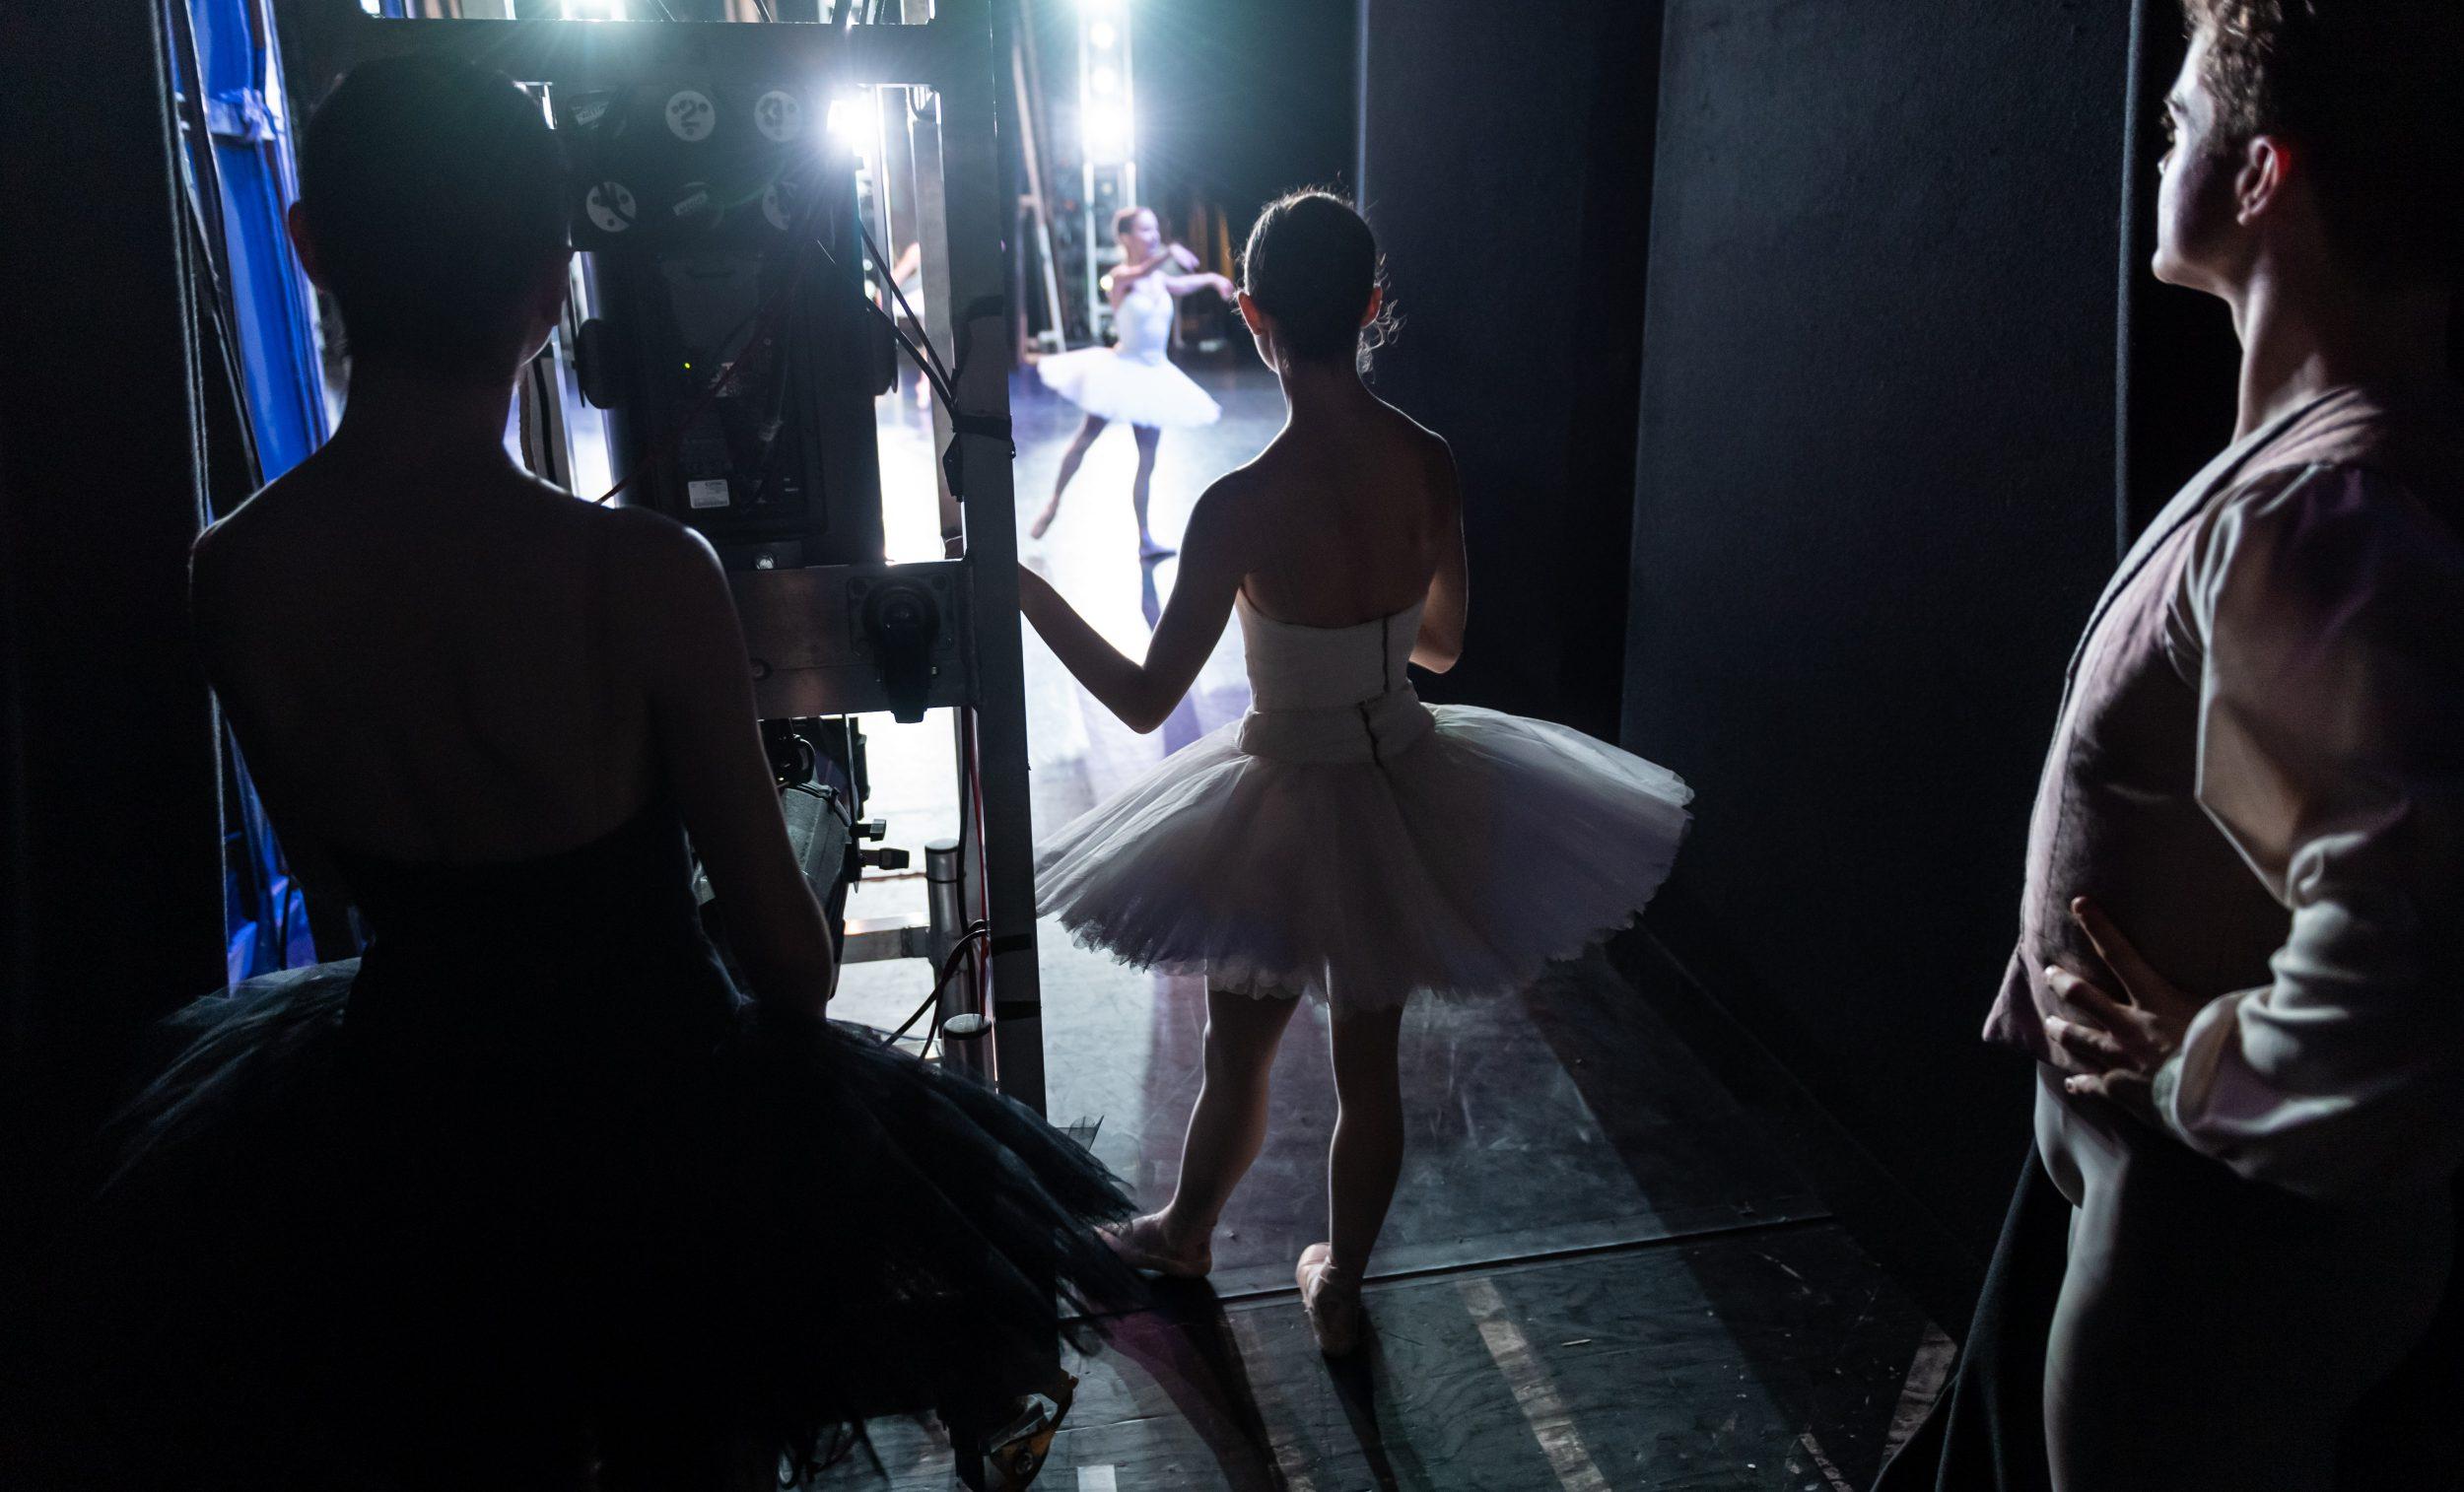 PRESS English National Ballet dancers backstage at the Company's 70th Anniversary Gala (c) Ian Gavan